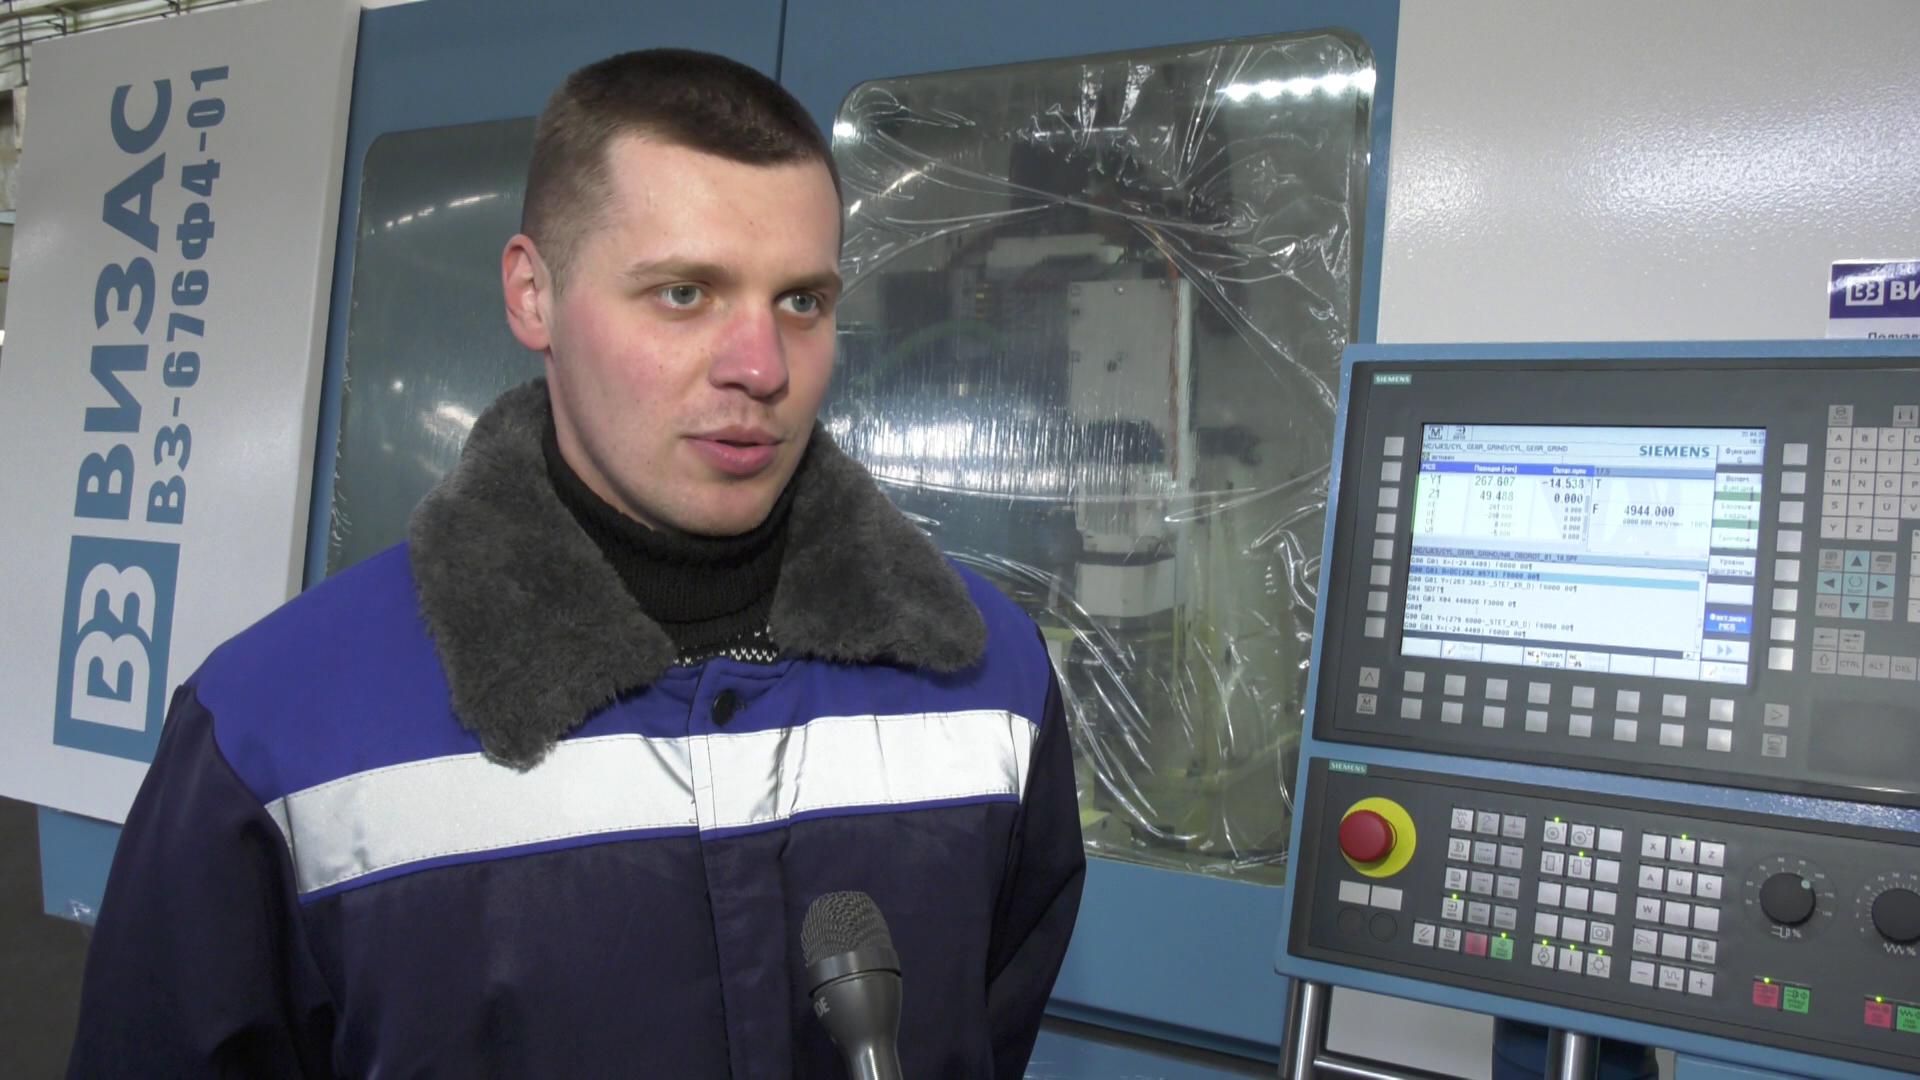 vizas - Витебский «ВИЗАС» создаёт современные станки (видео)